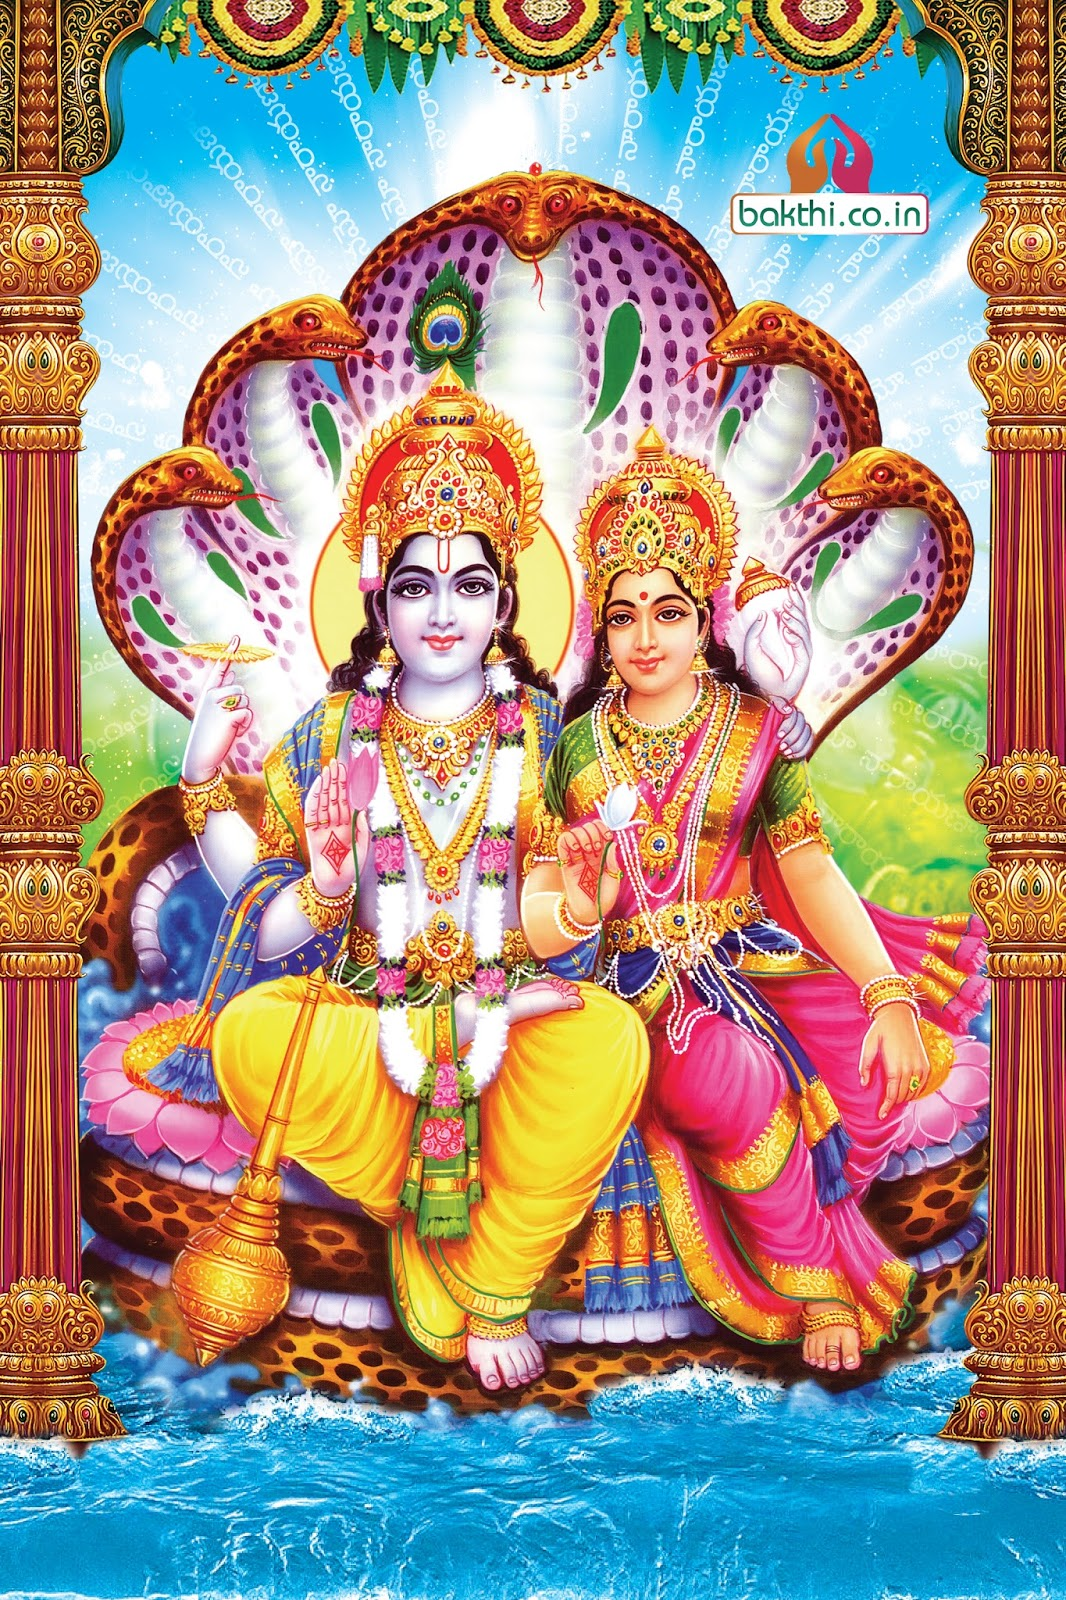 Lakshmi Narasimha Swamy Wallpapers Free Download The Galleries Of